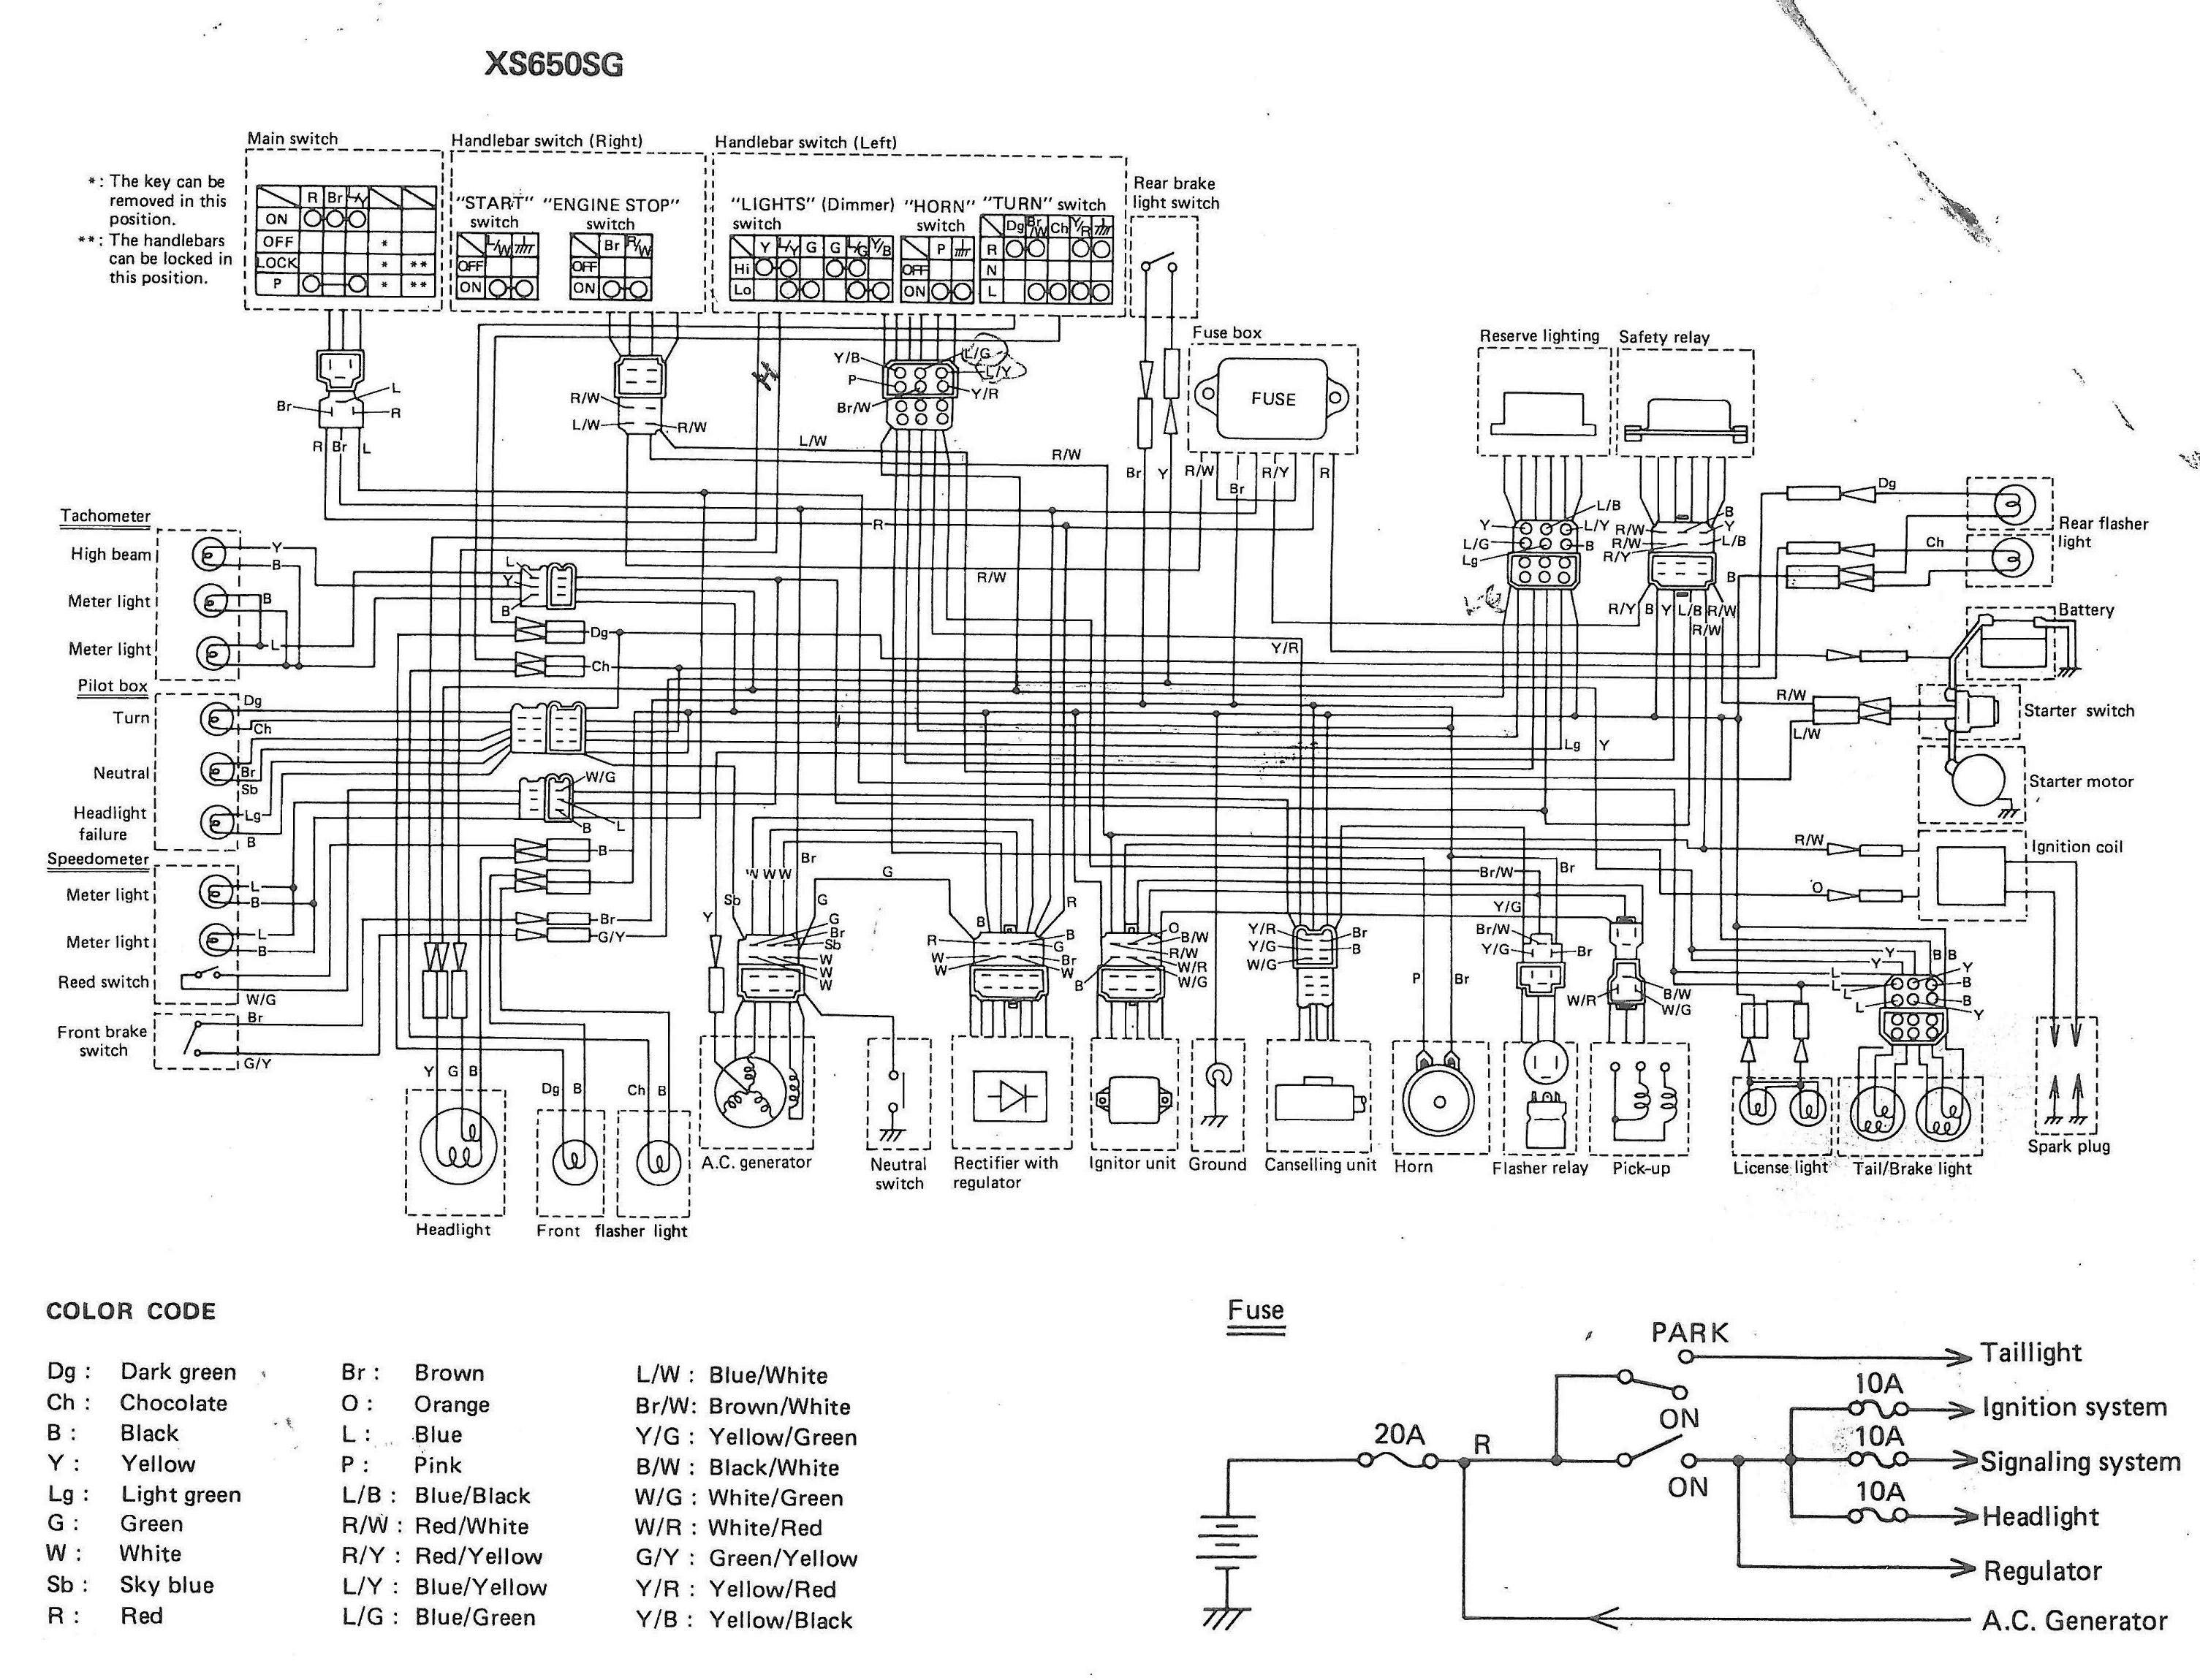 1979 yamaha xs1100 wiring diagram european 6 1979 yamaha xs1100 wiring diagram european